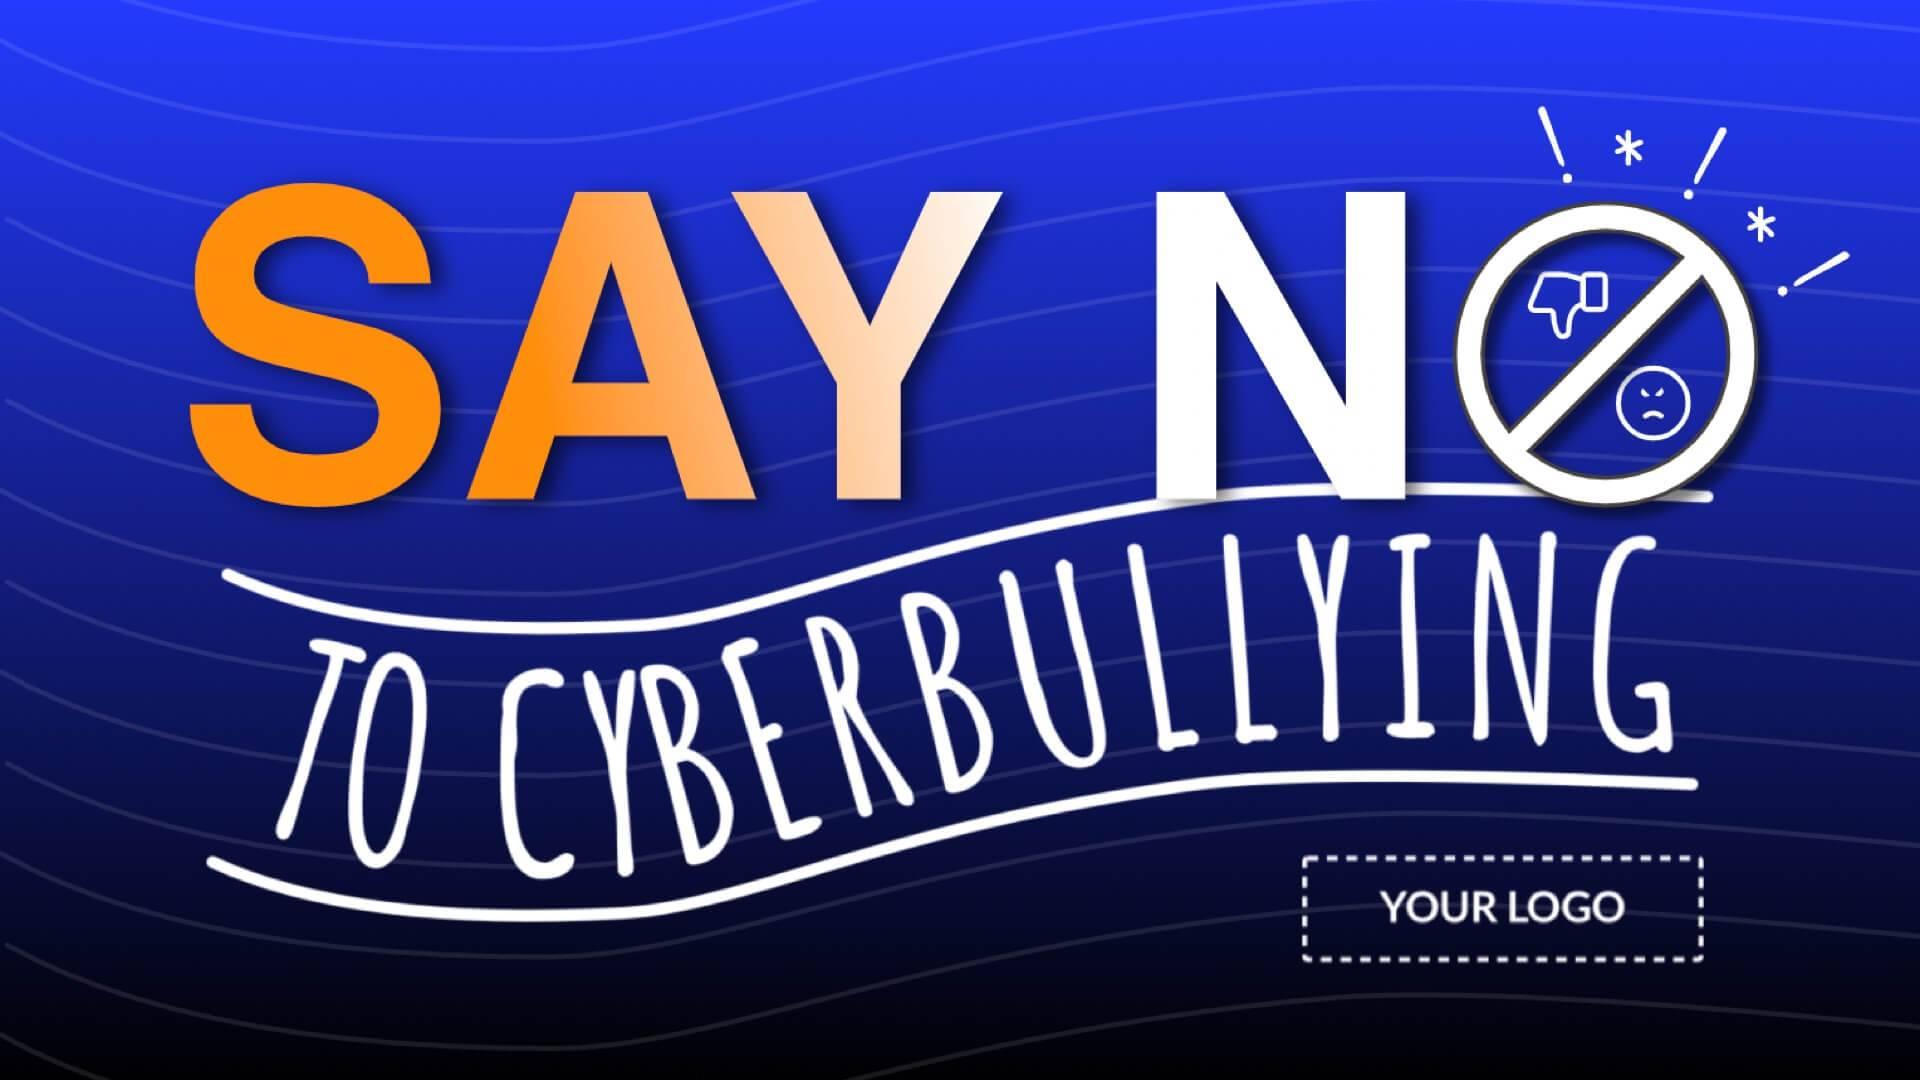 Cyberbullying Digital Signage Template